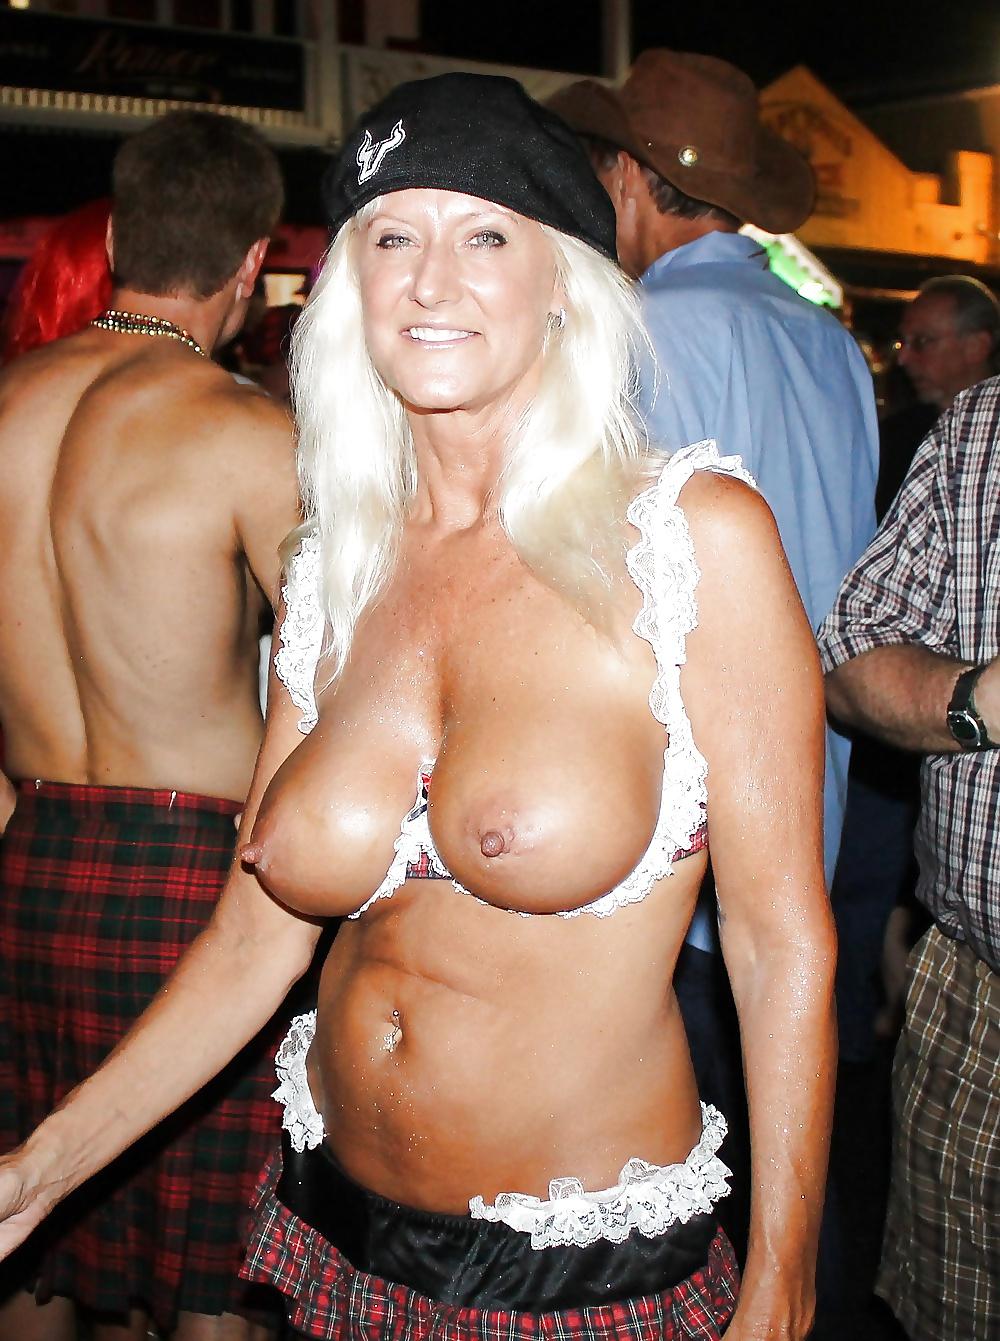 Wife in key west, free hardcore virgin anal porn movie